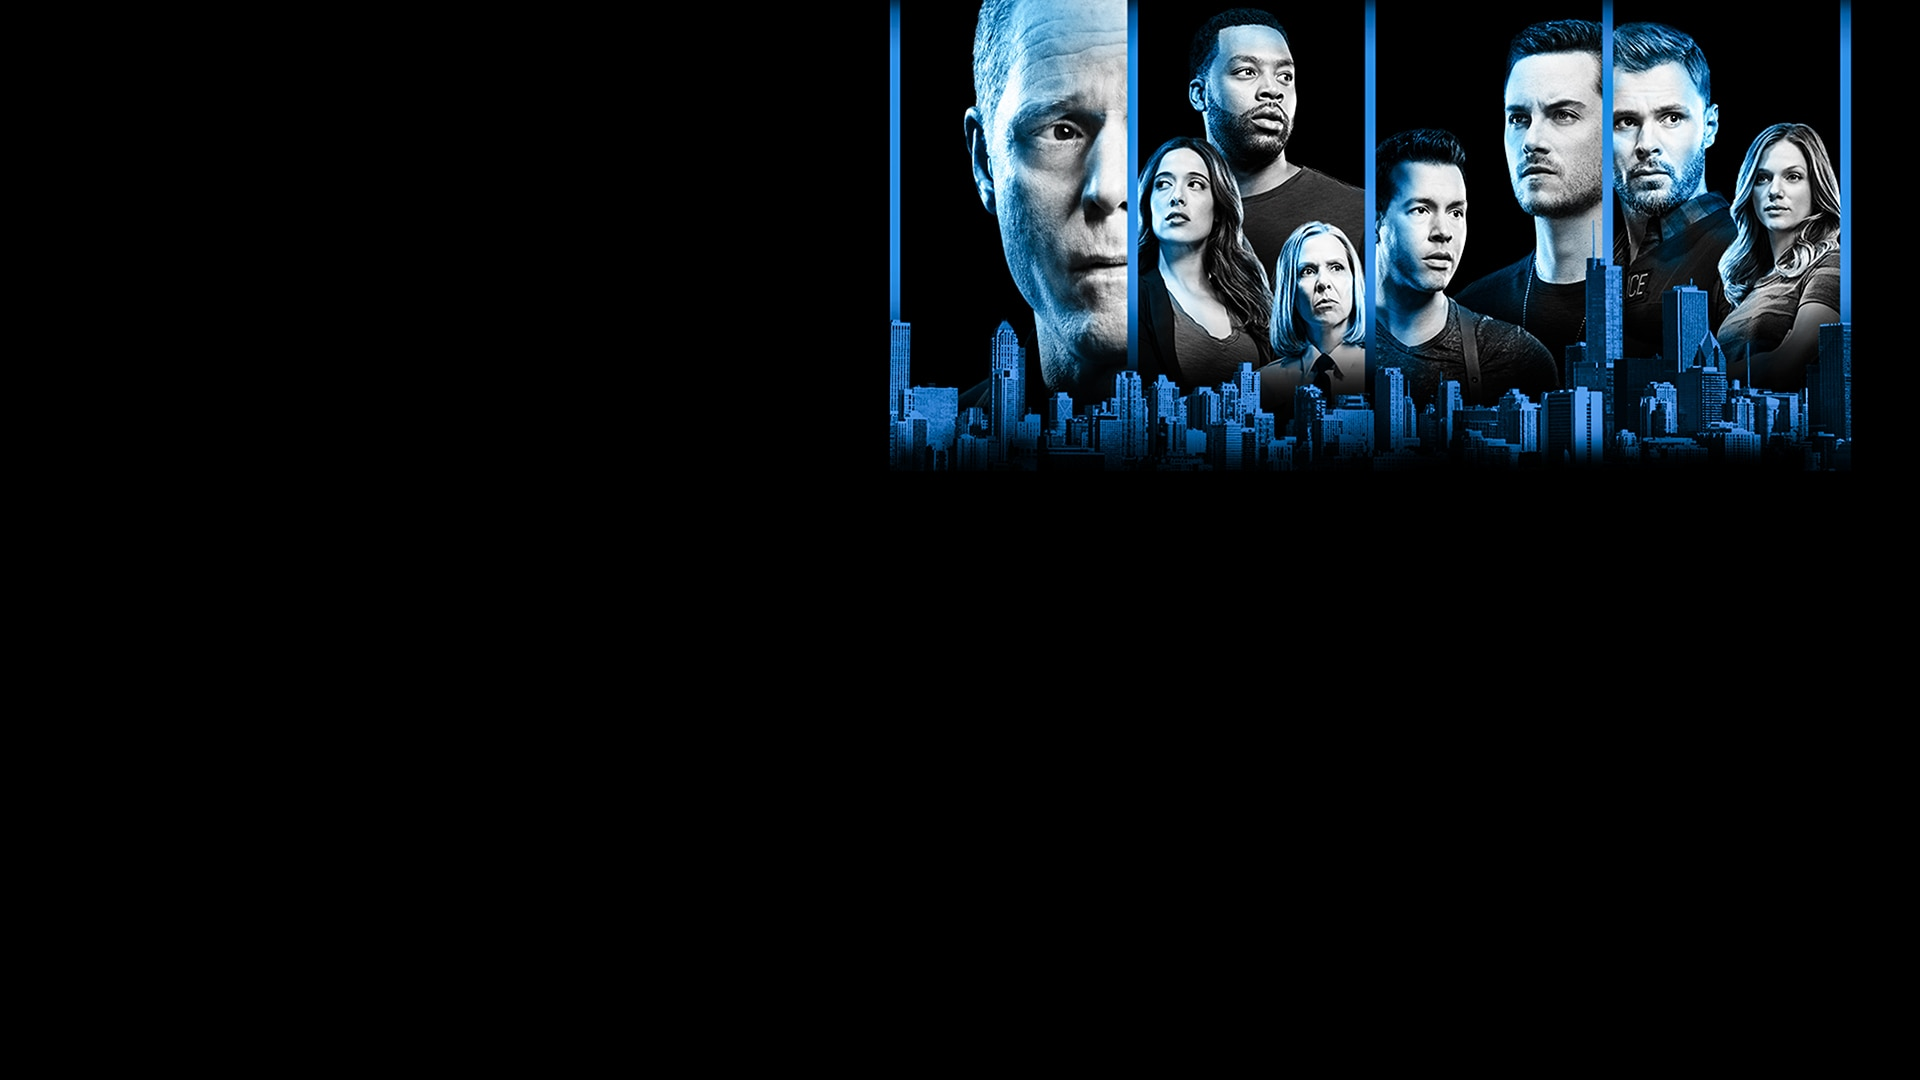 chicago fire season 1 download utorrent